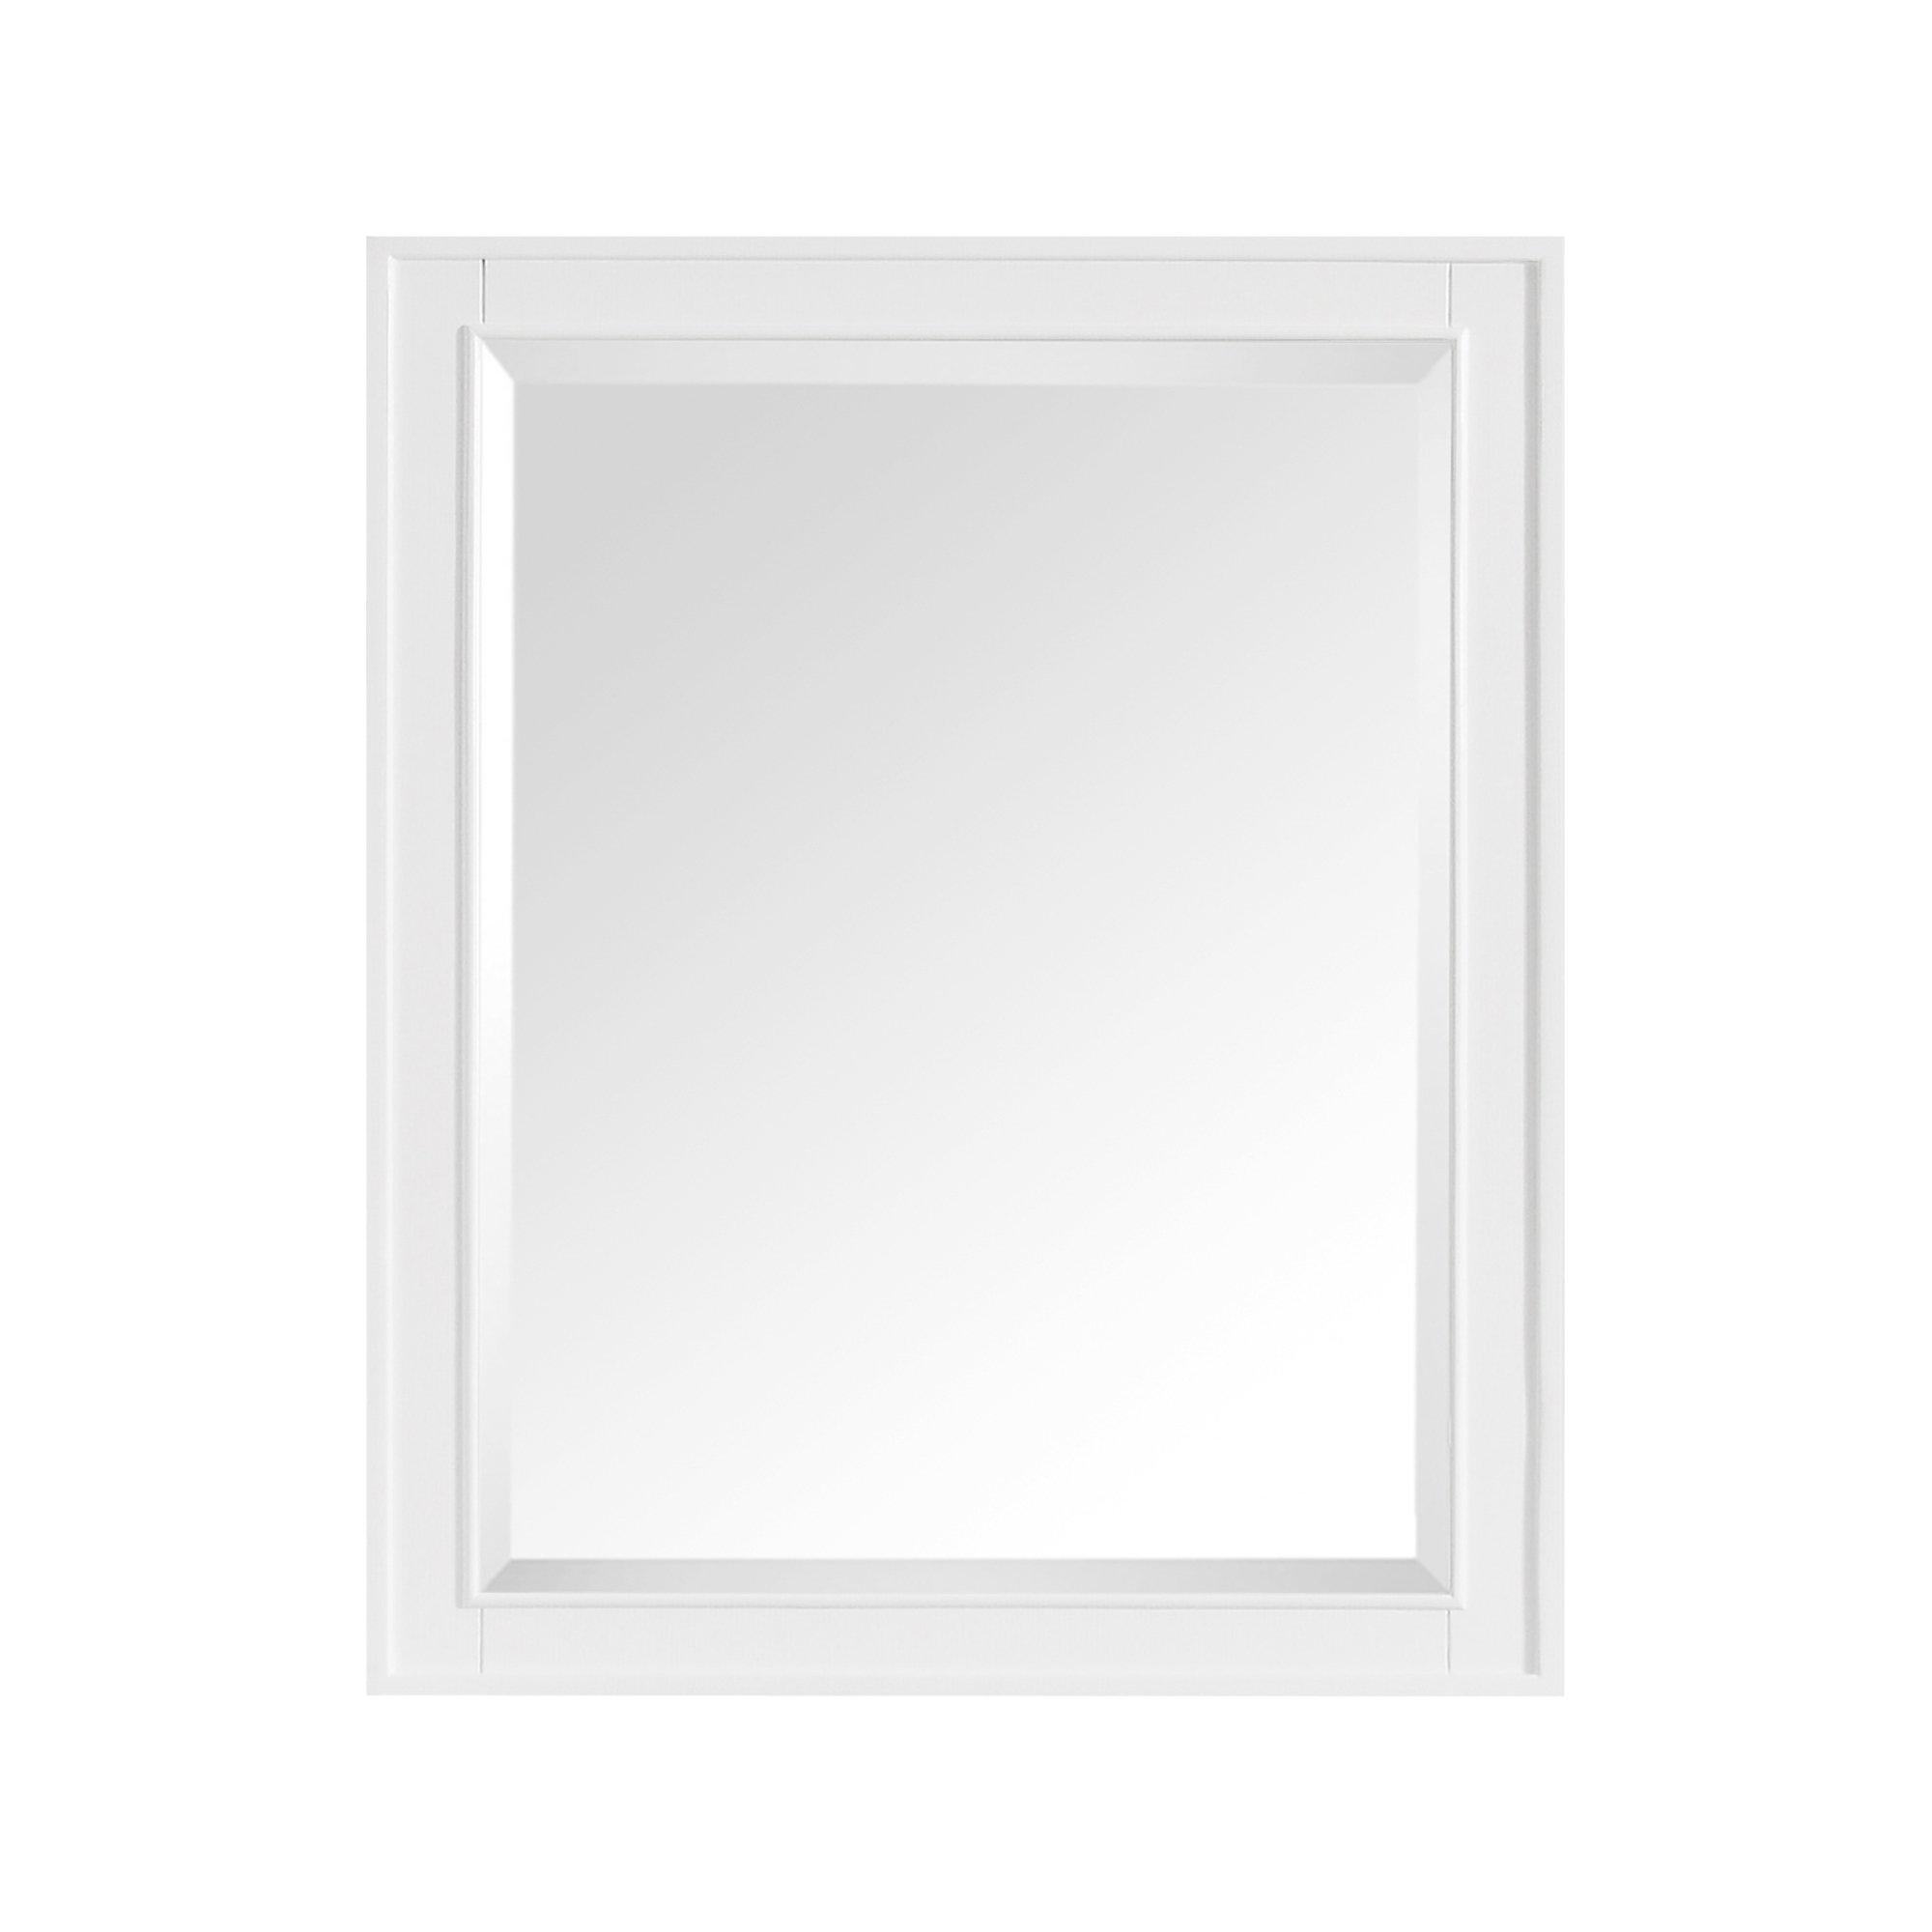 Avanity Madison 28 in. Mirror in White finish